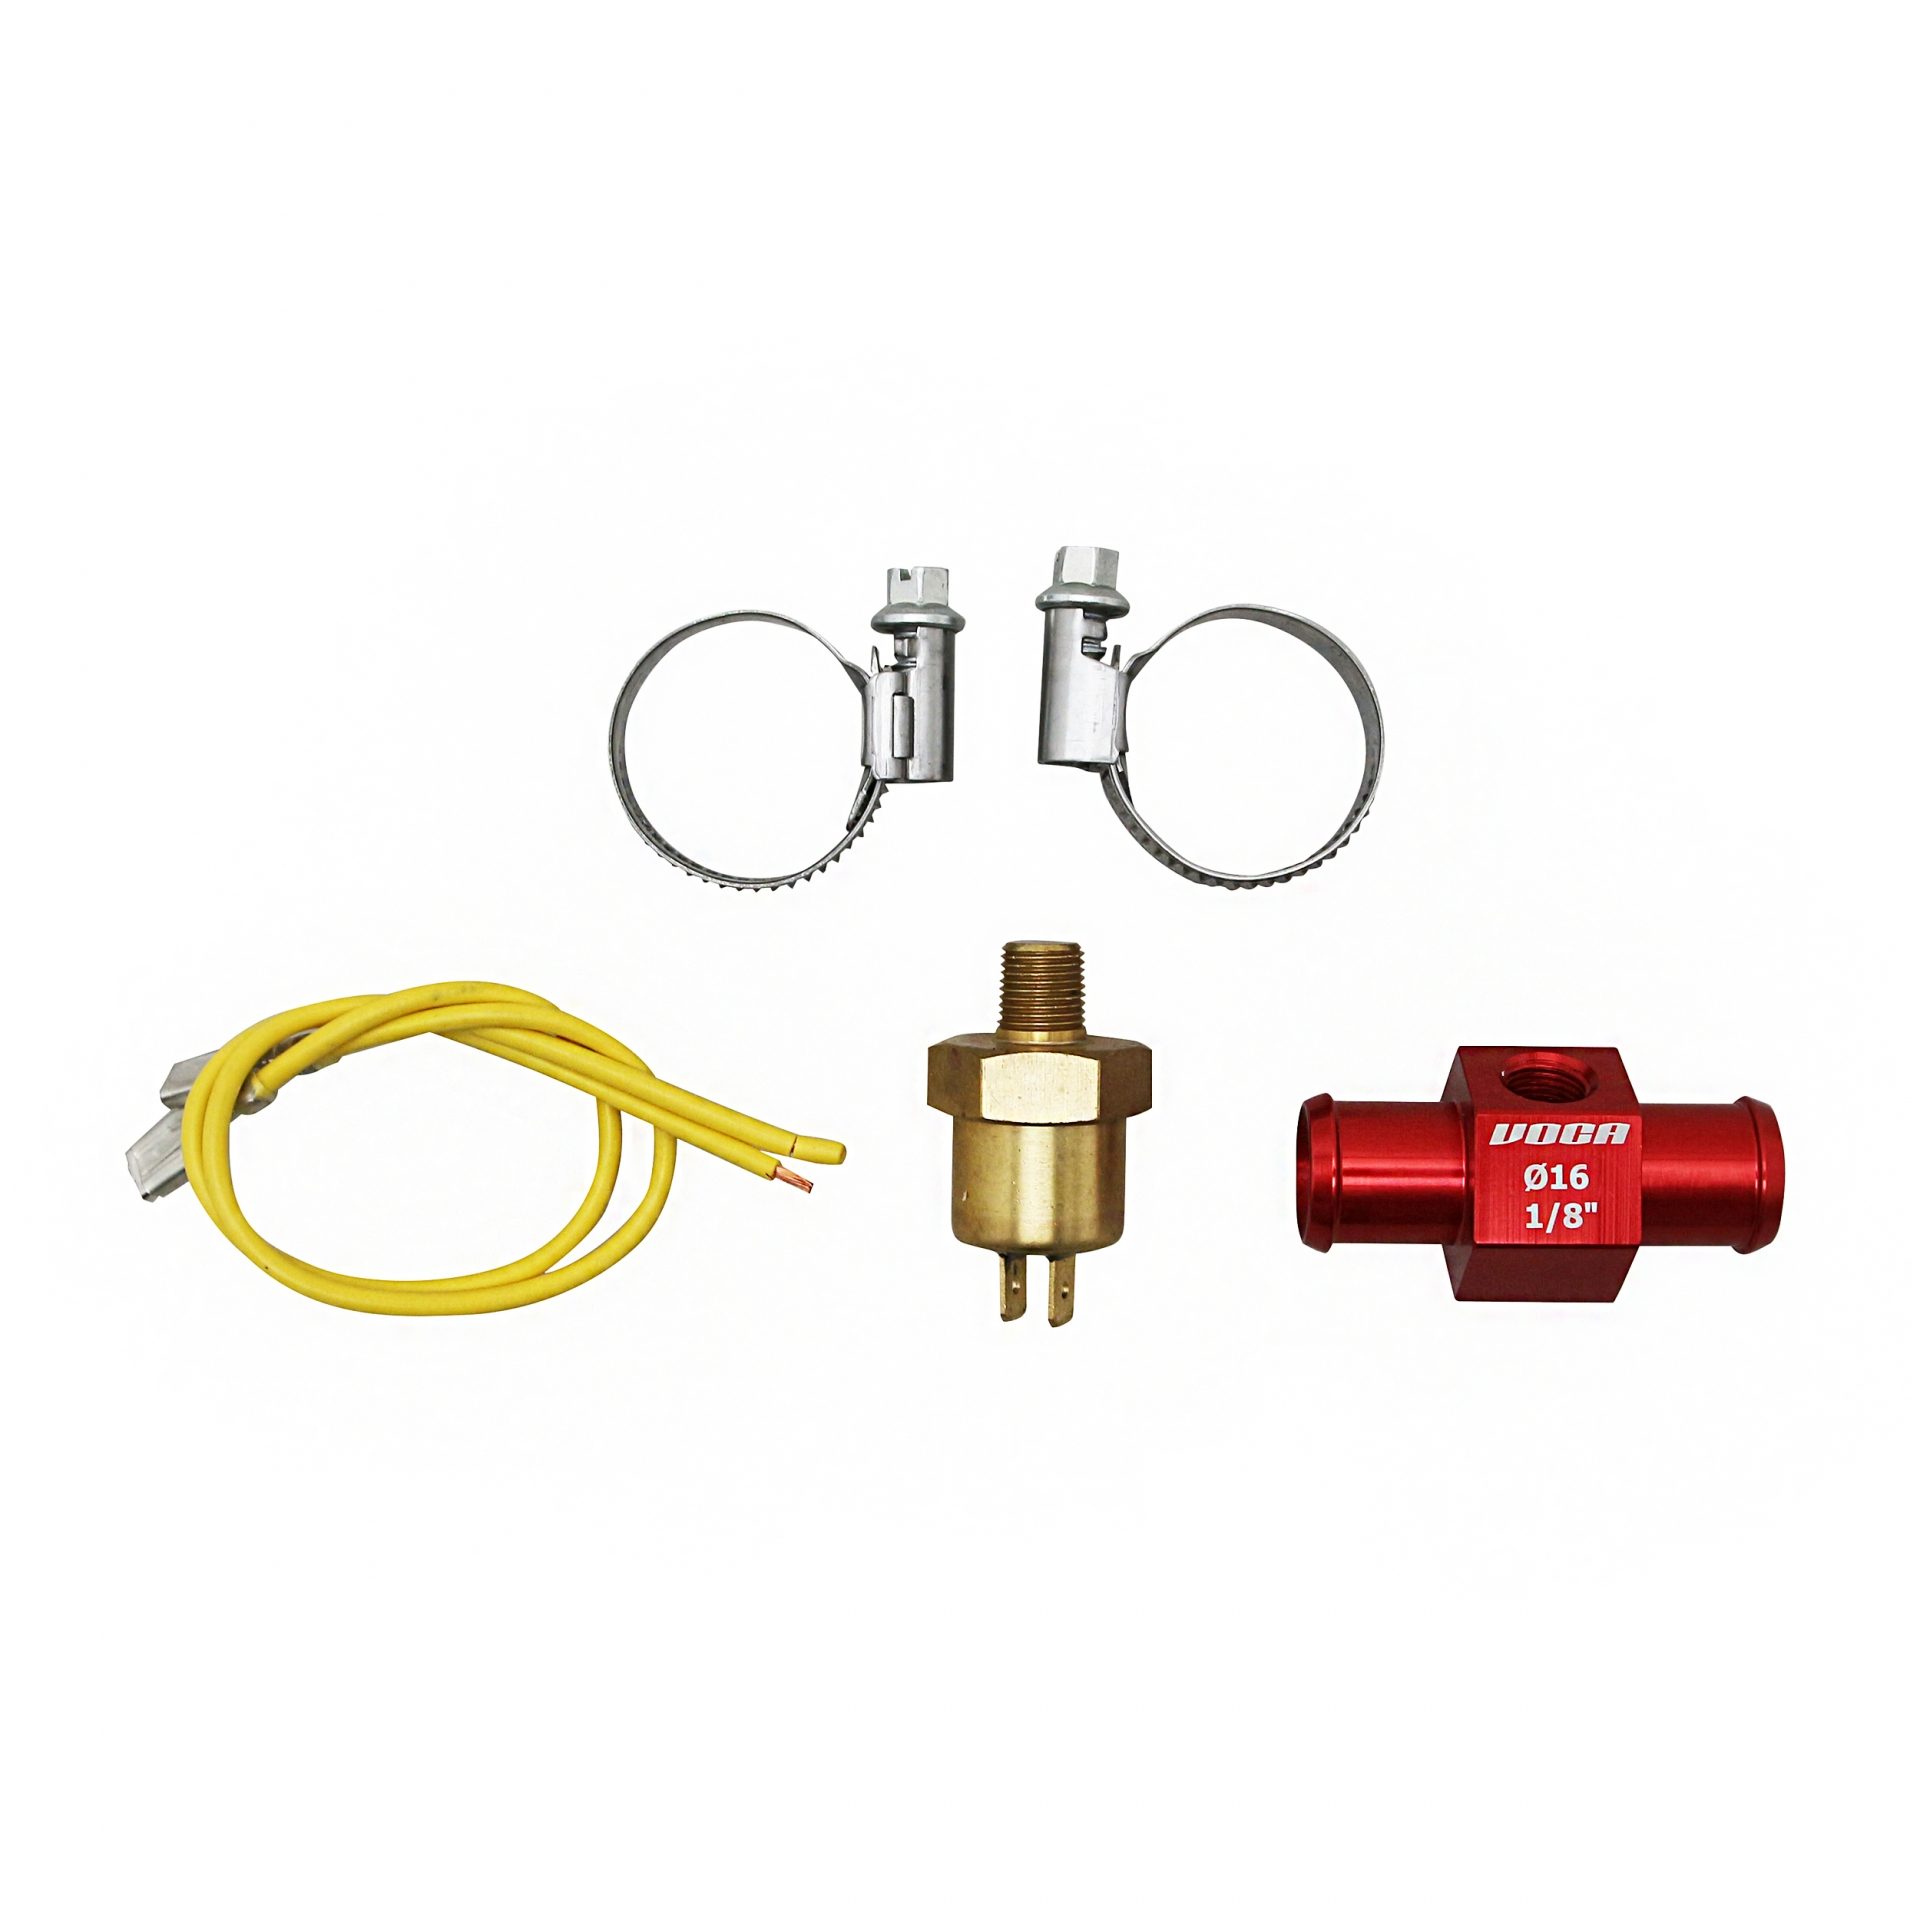 Sonde de température Voca Racing avec adaptateur Ø16